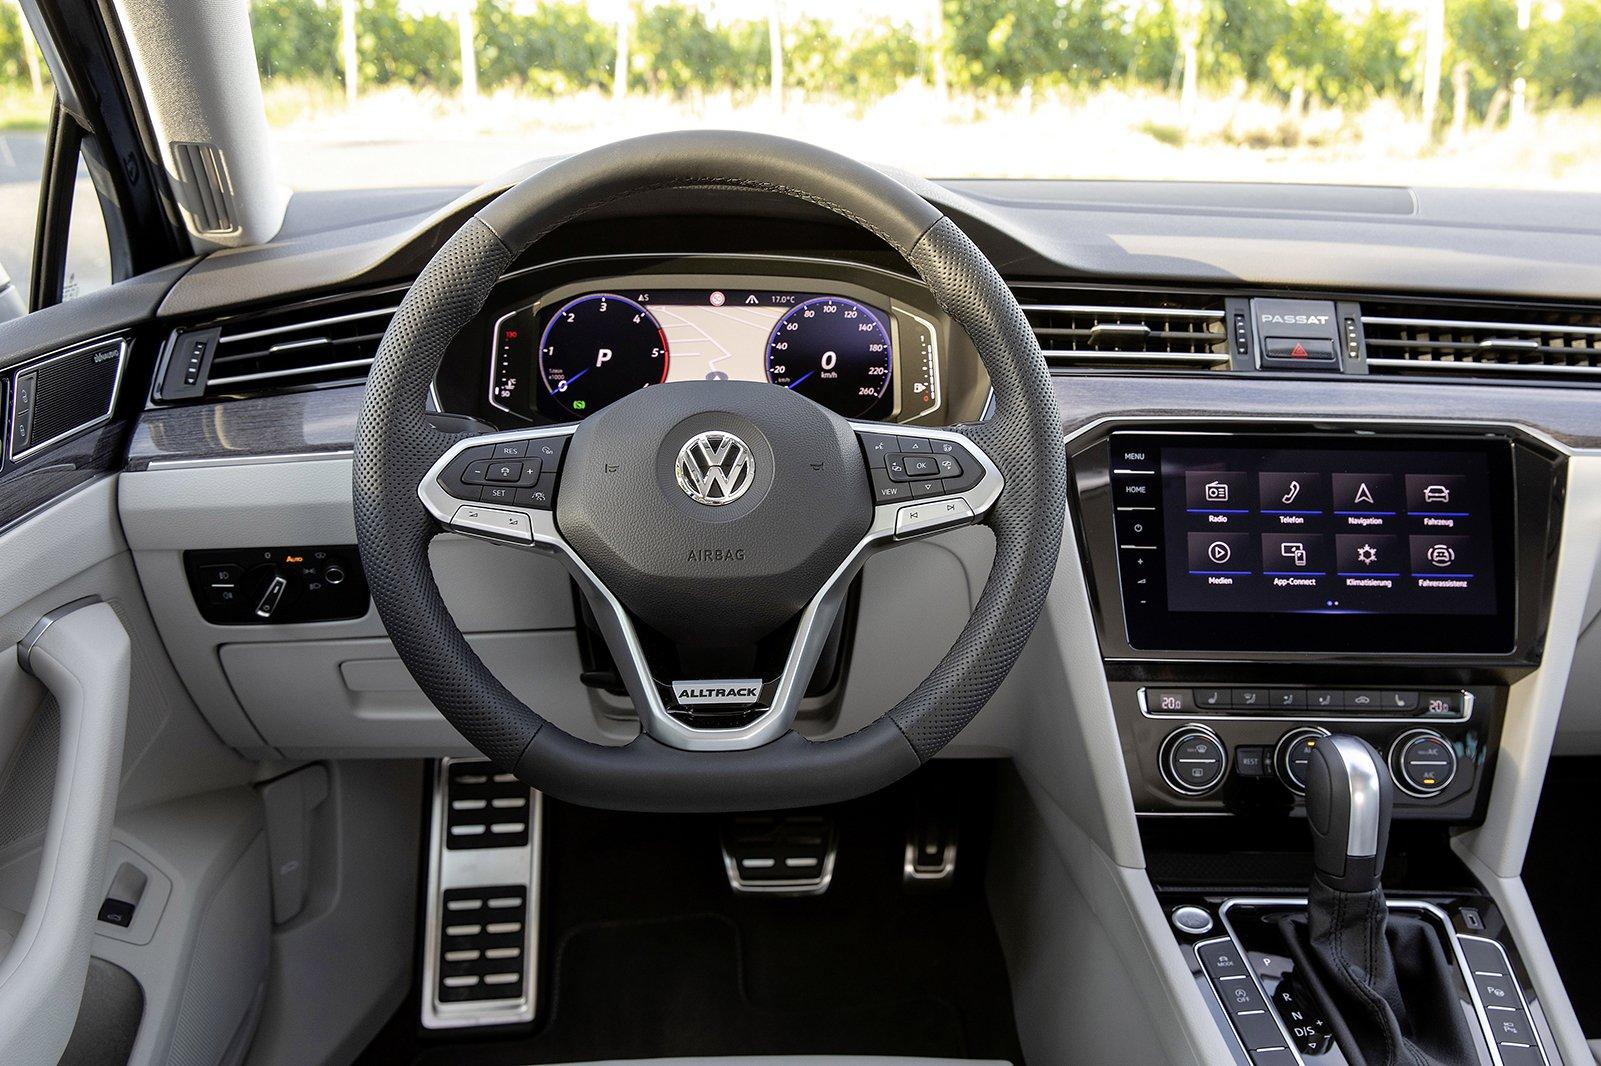 Volkswagen Passat Alltrack 2019 LHD dashboard